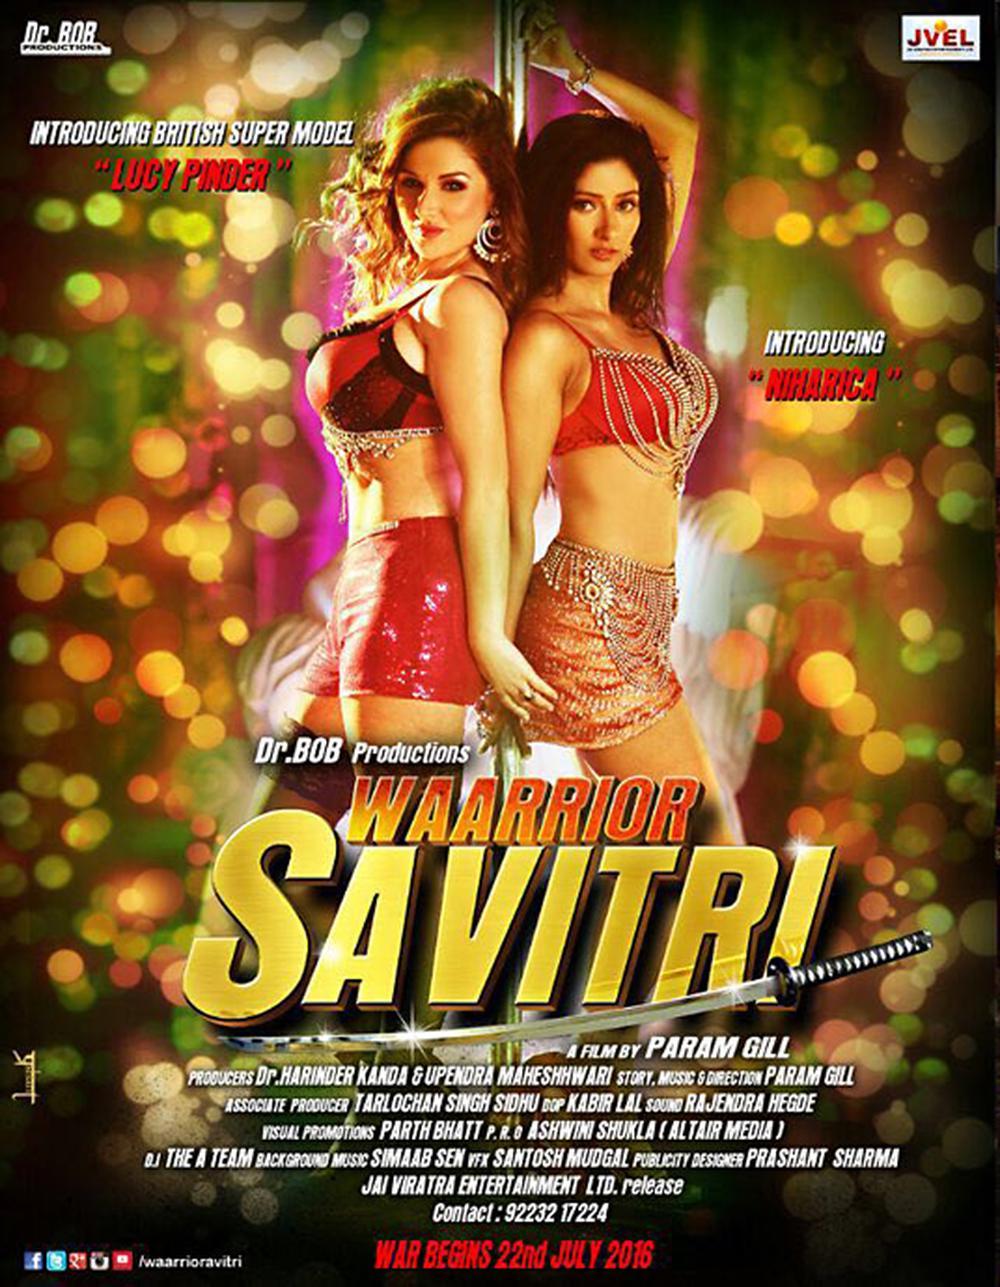 Waarrior Savitri Movie Review